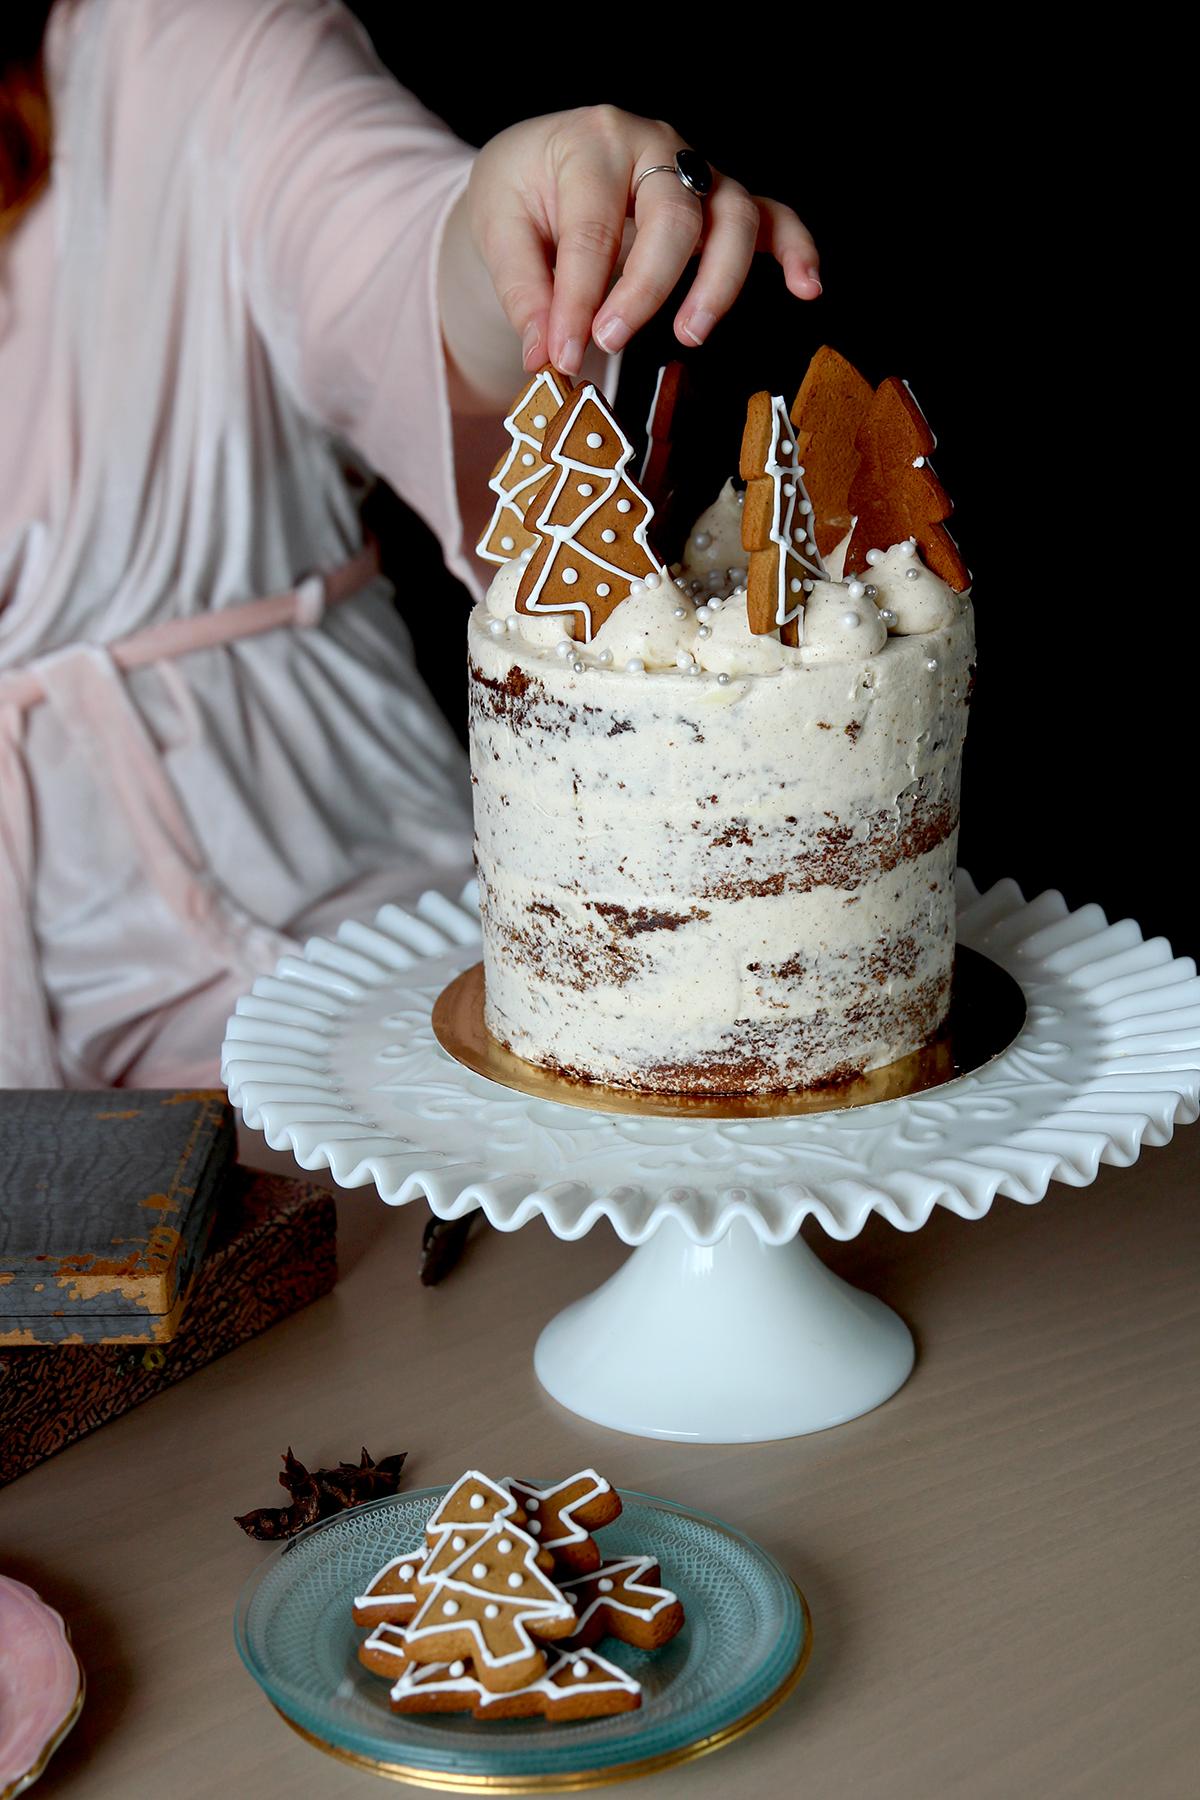 Gingerbread & cookies cake